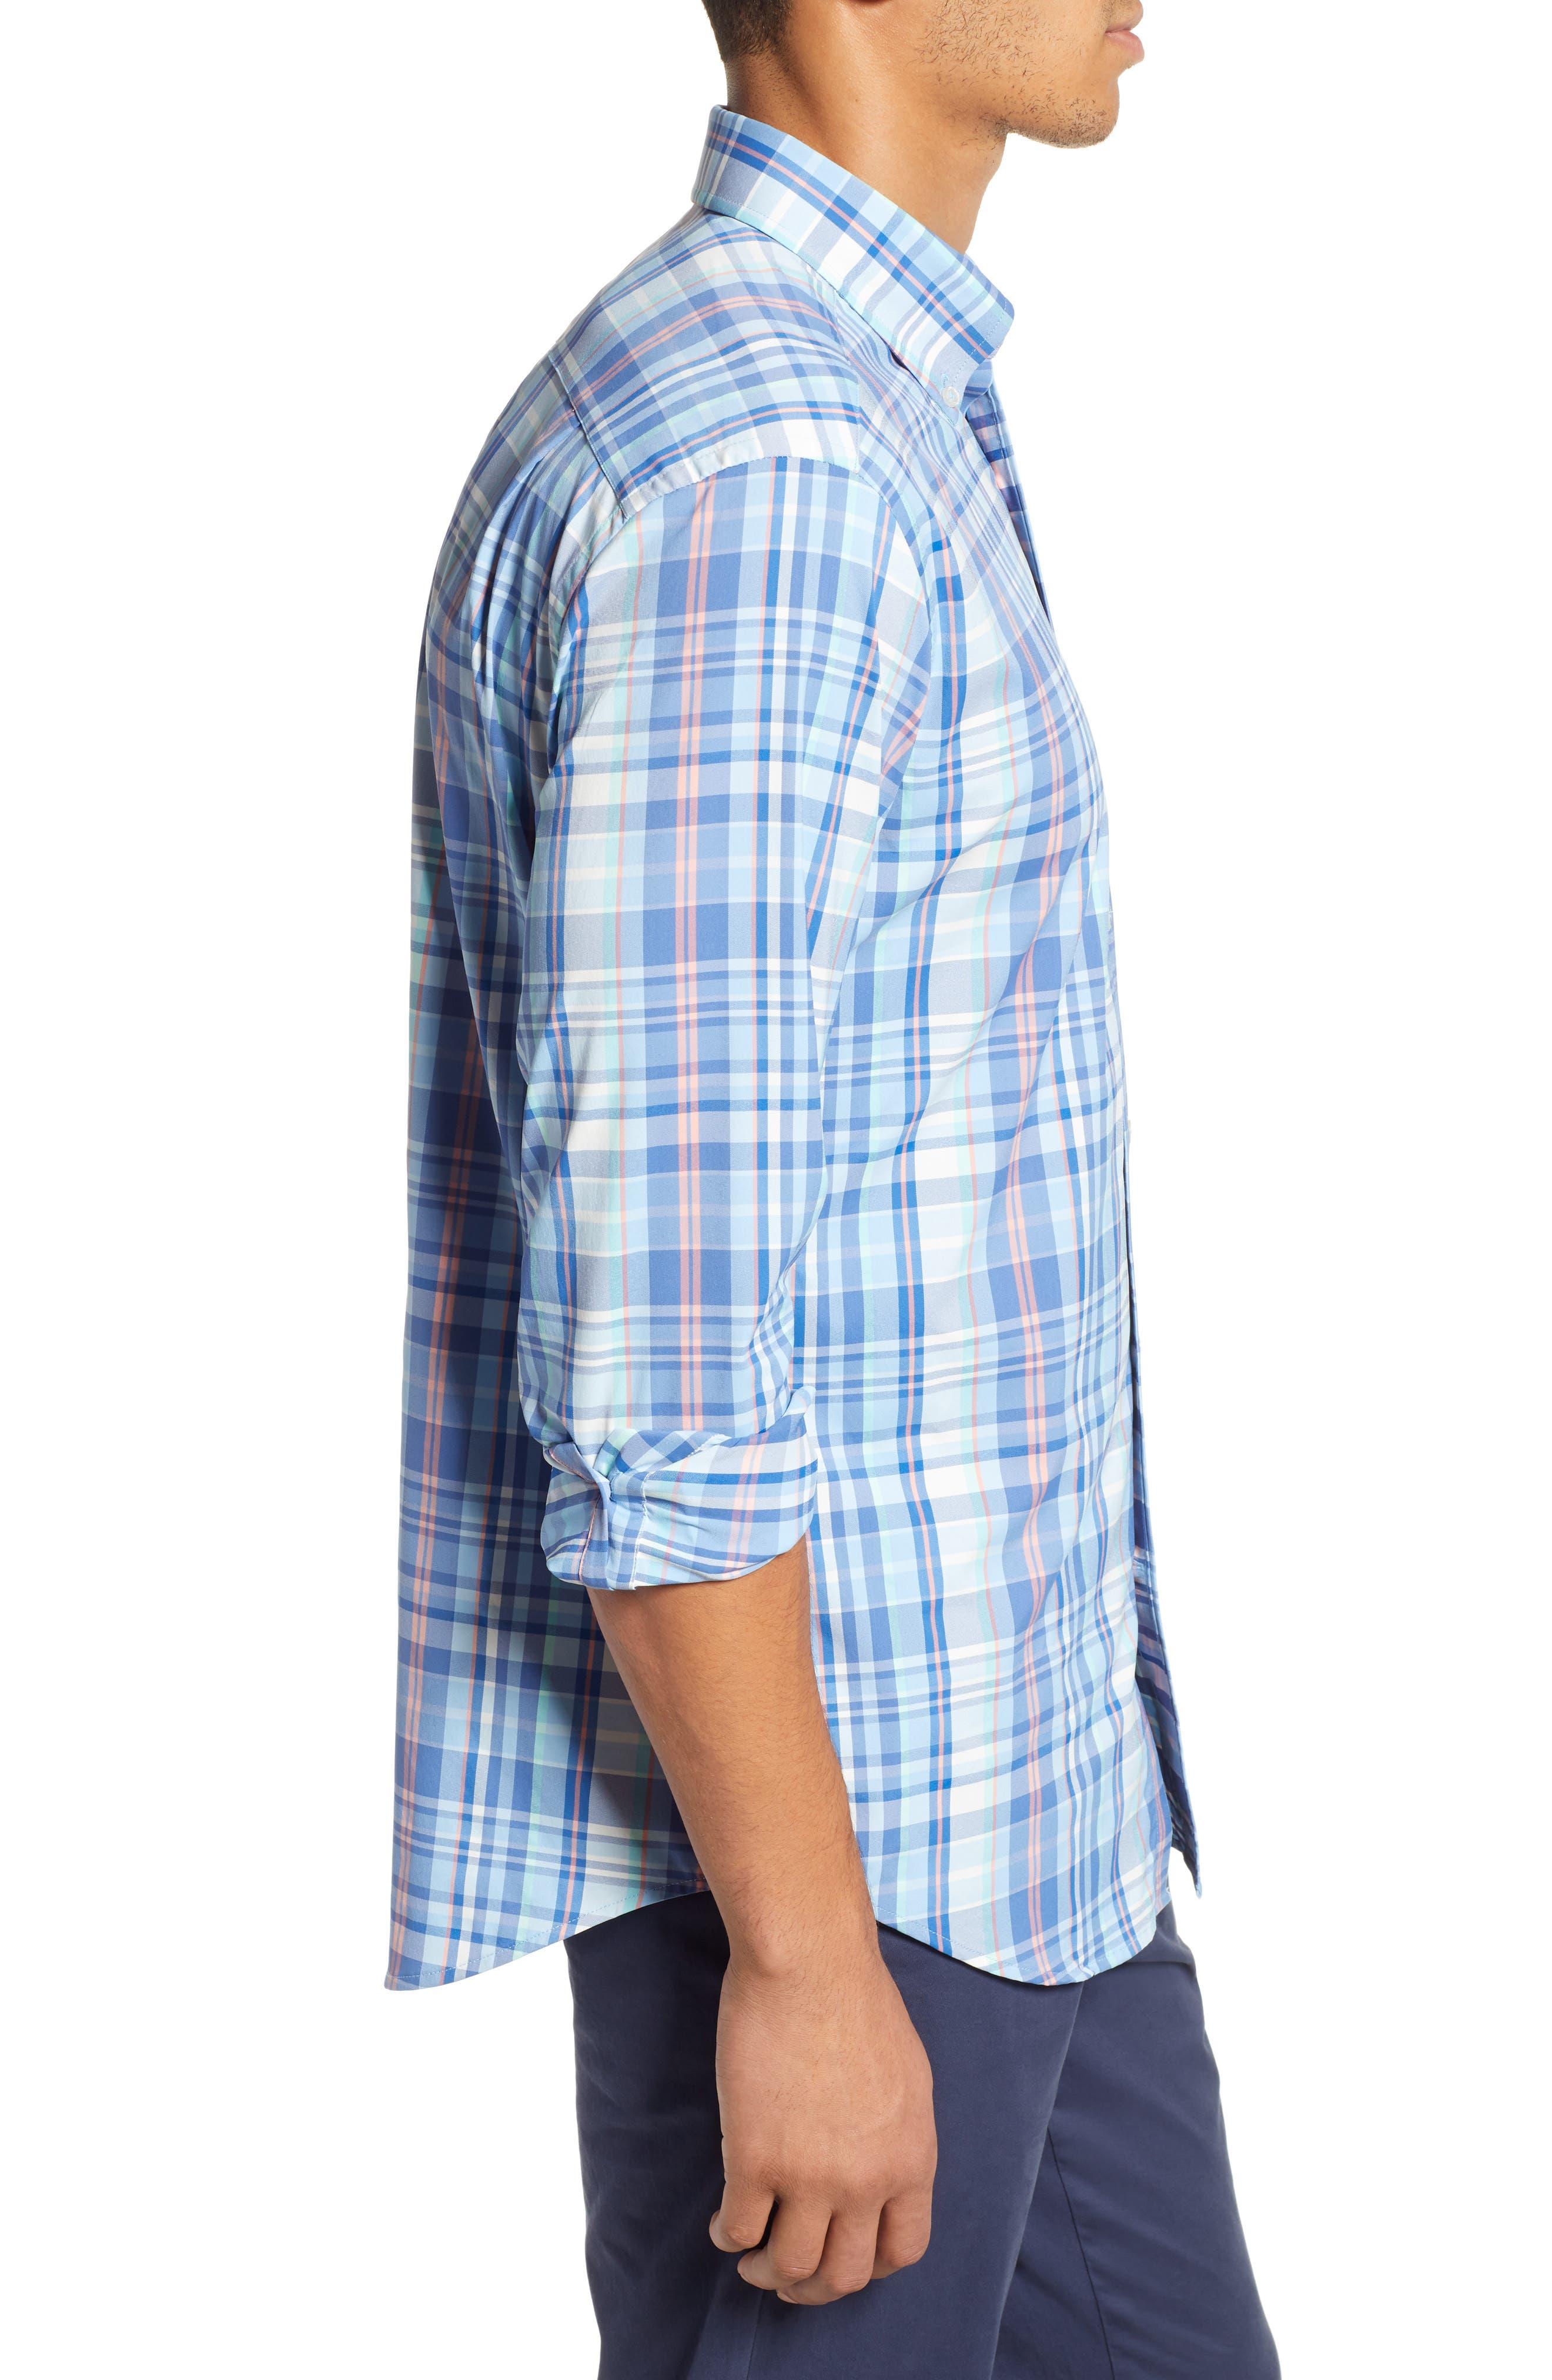 Siesta Intercoastal Regular Fit Plaid Performance Sport Shirt,                             Alternate thumbnail 4, color,                             SKY BLUE